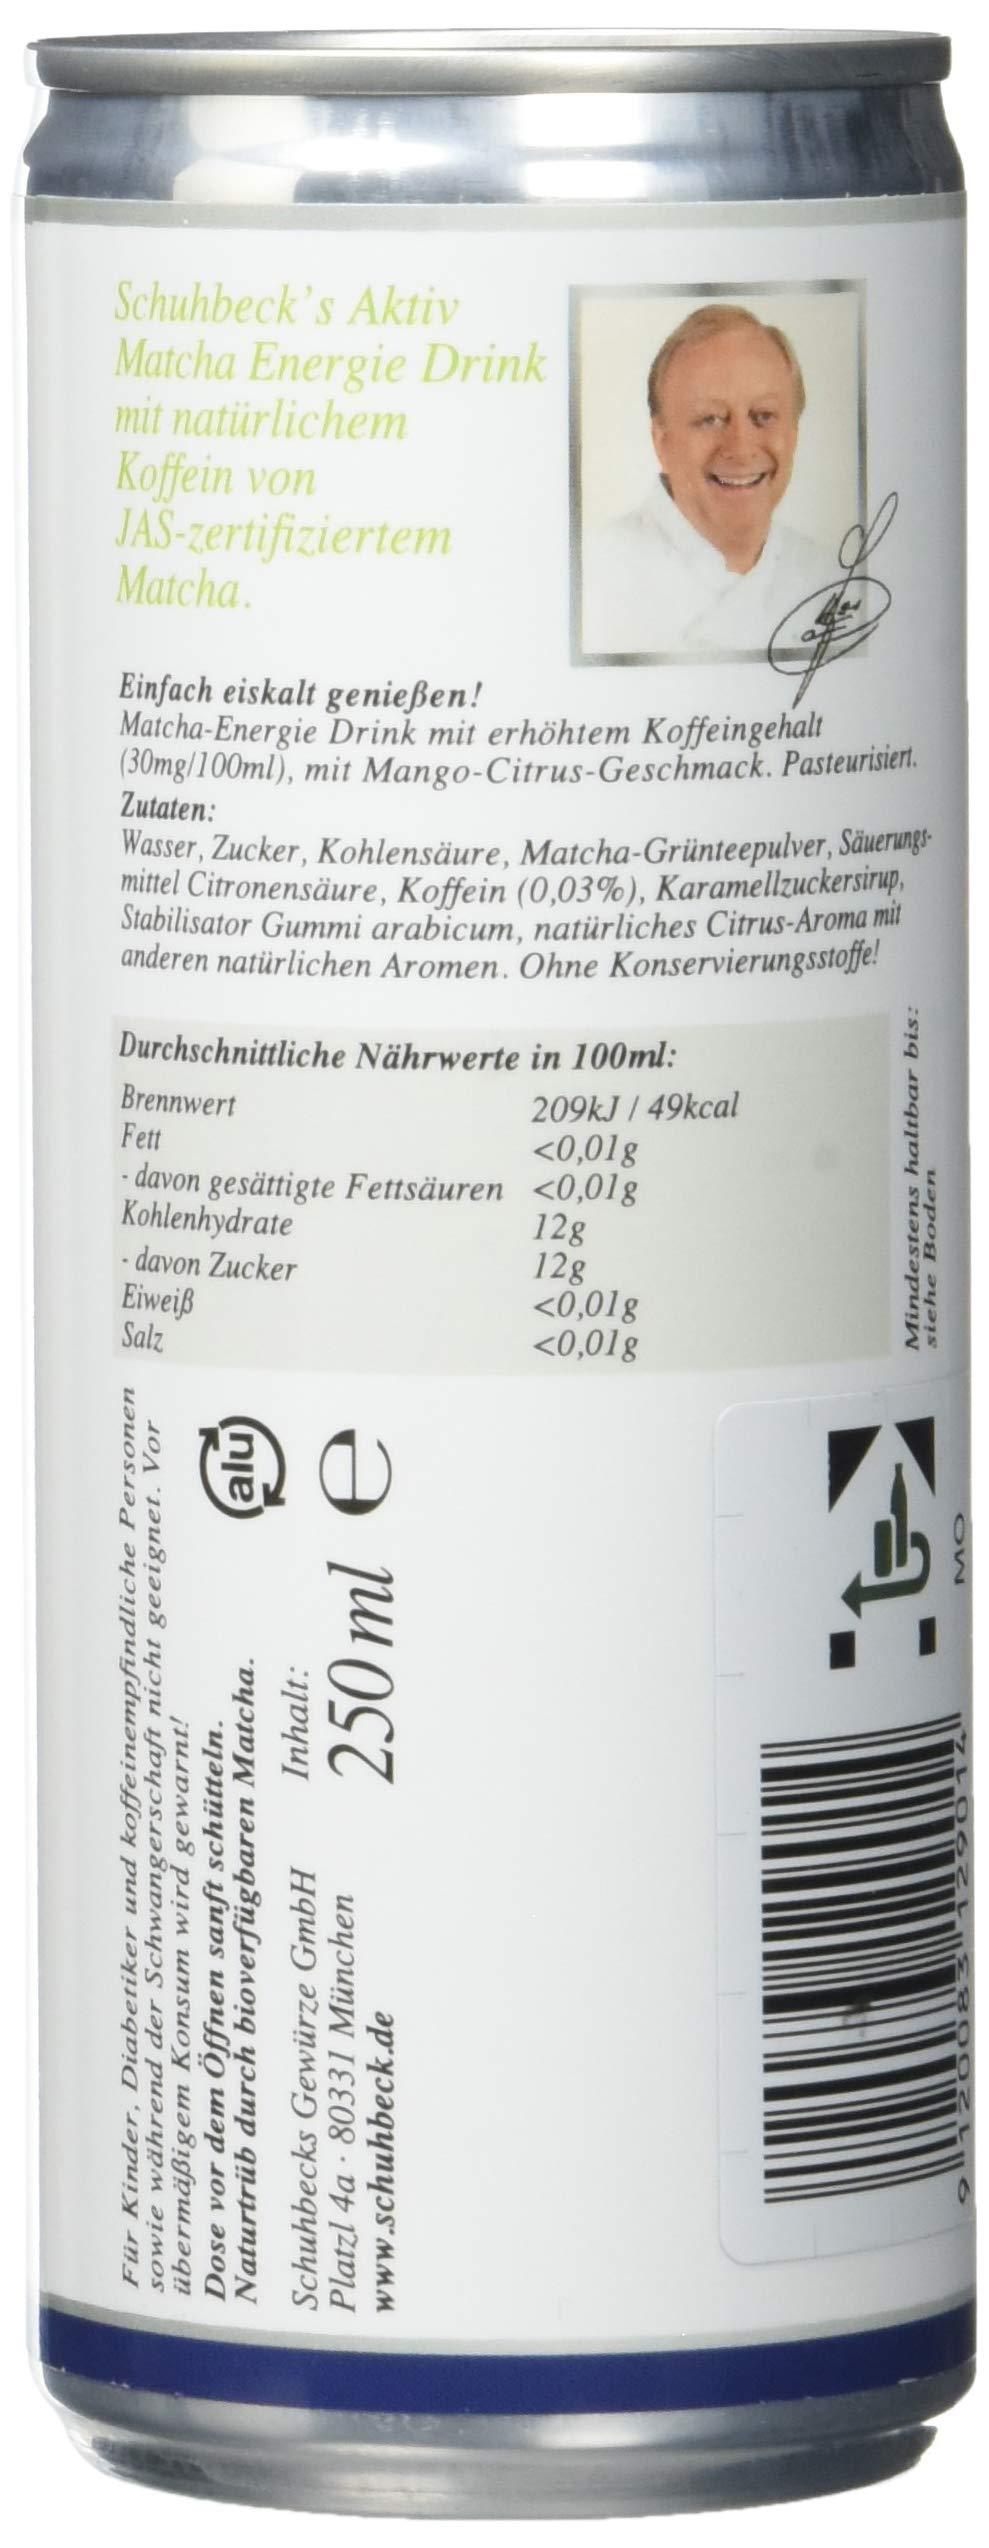 Schuhbeck-Matcha-Energie-Drink-5er-Pack-5-x-250-ml